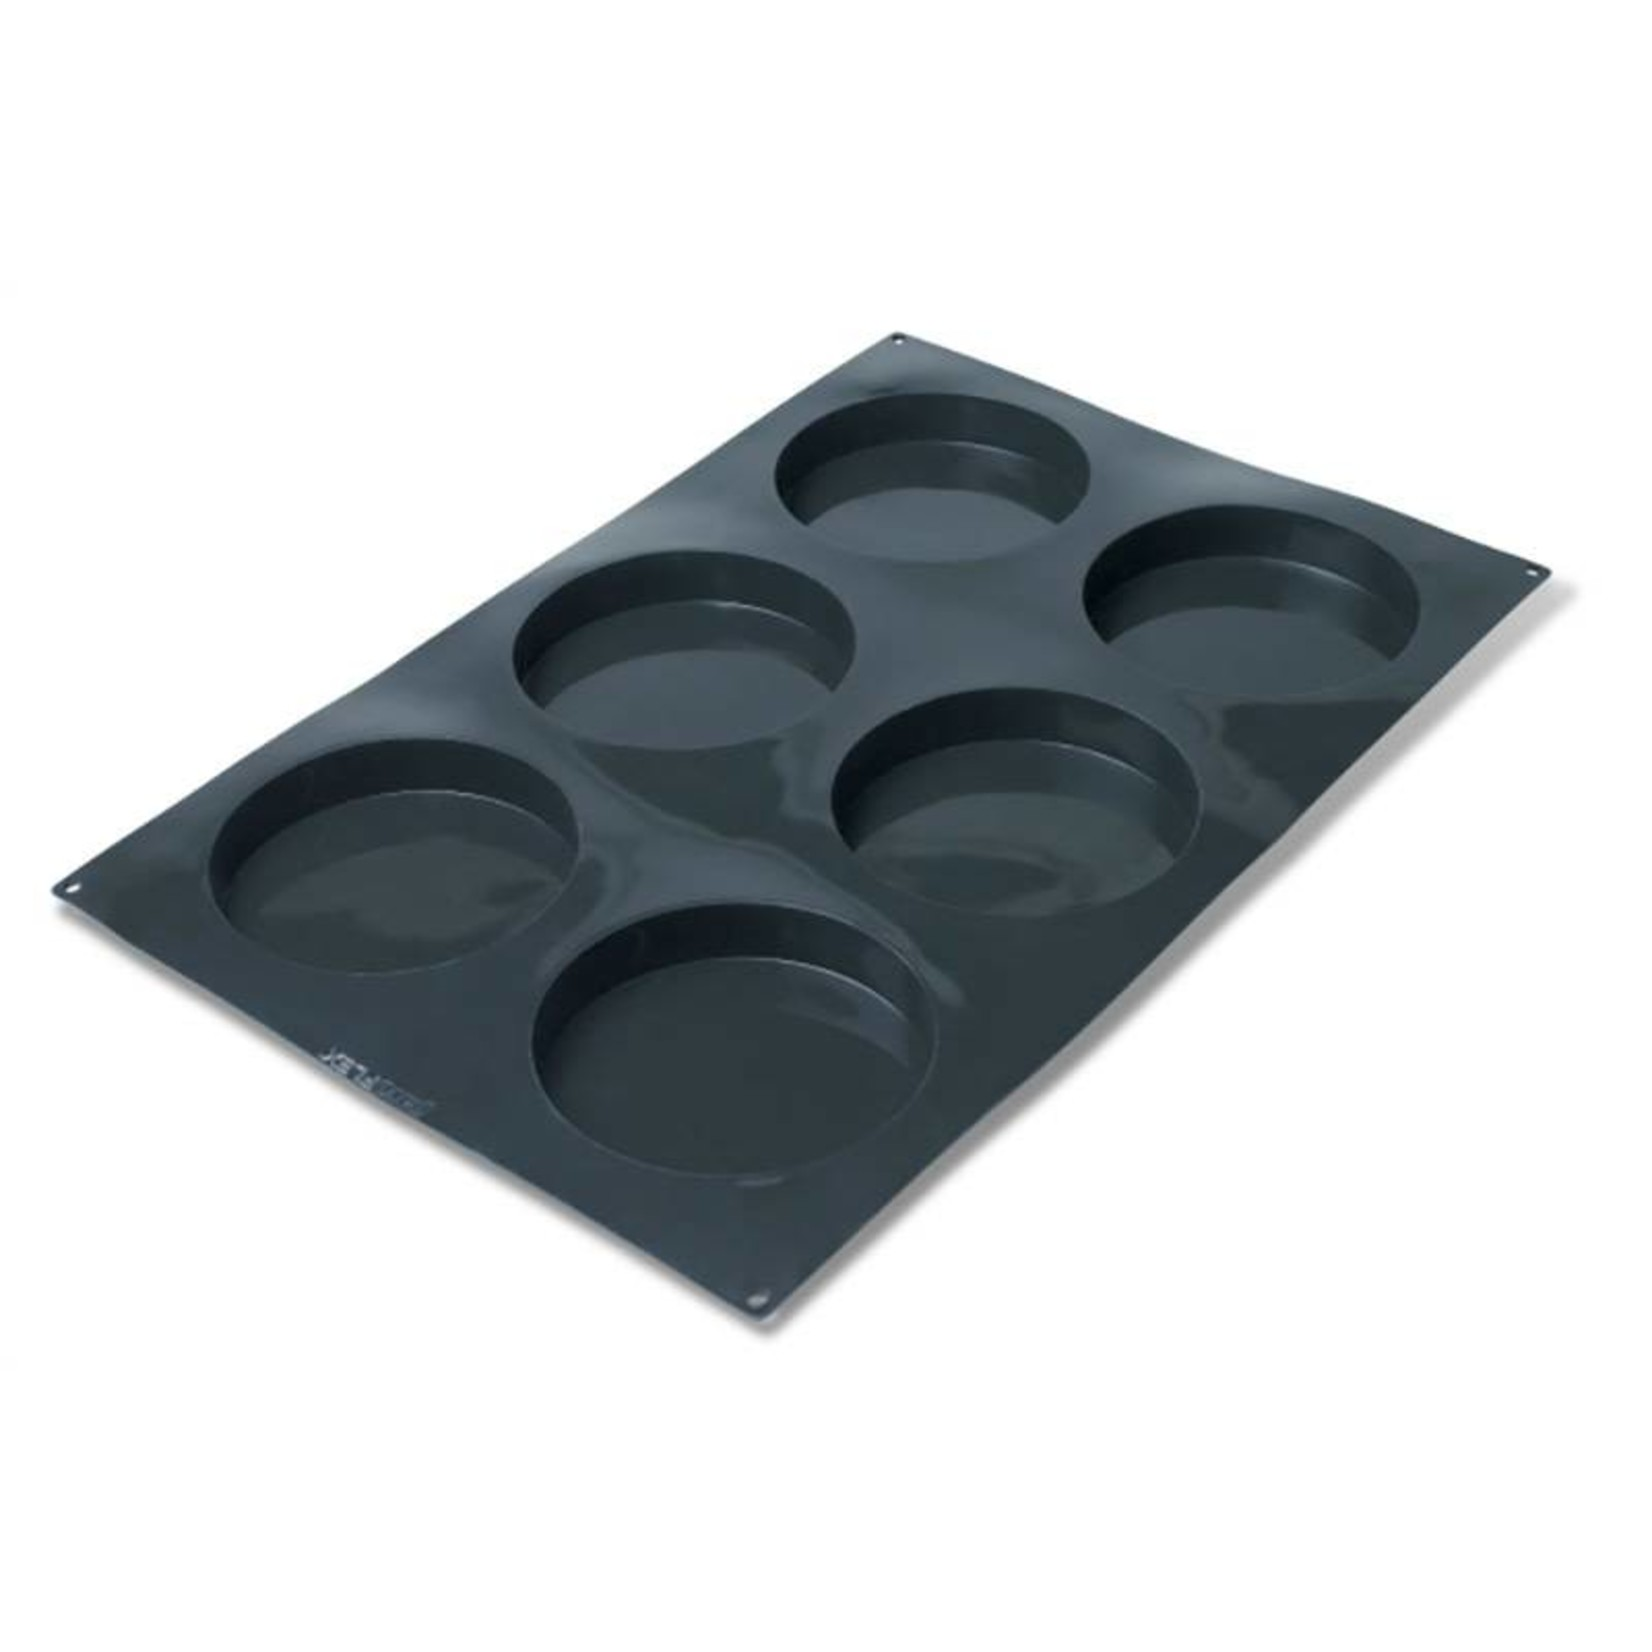 Pavoni Pavoni - Pavoflex silicone mold, Inserimento, (6 cavity), PX061